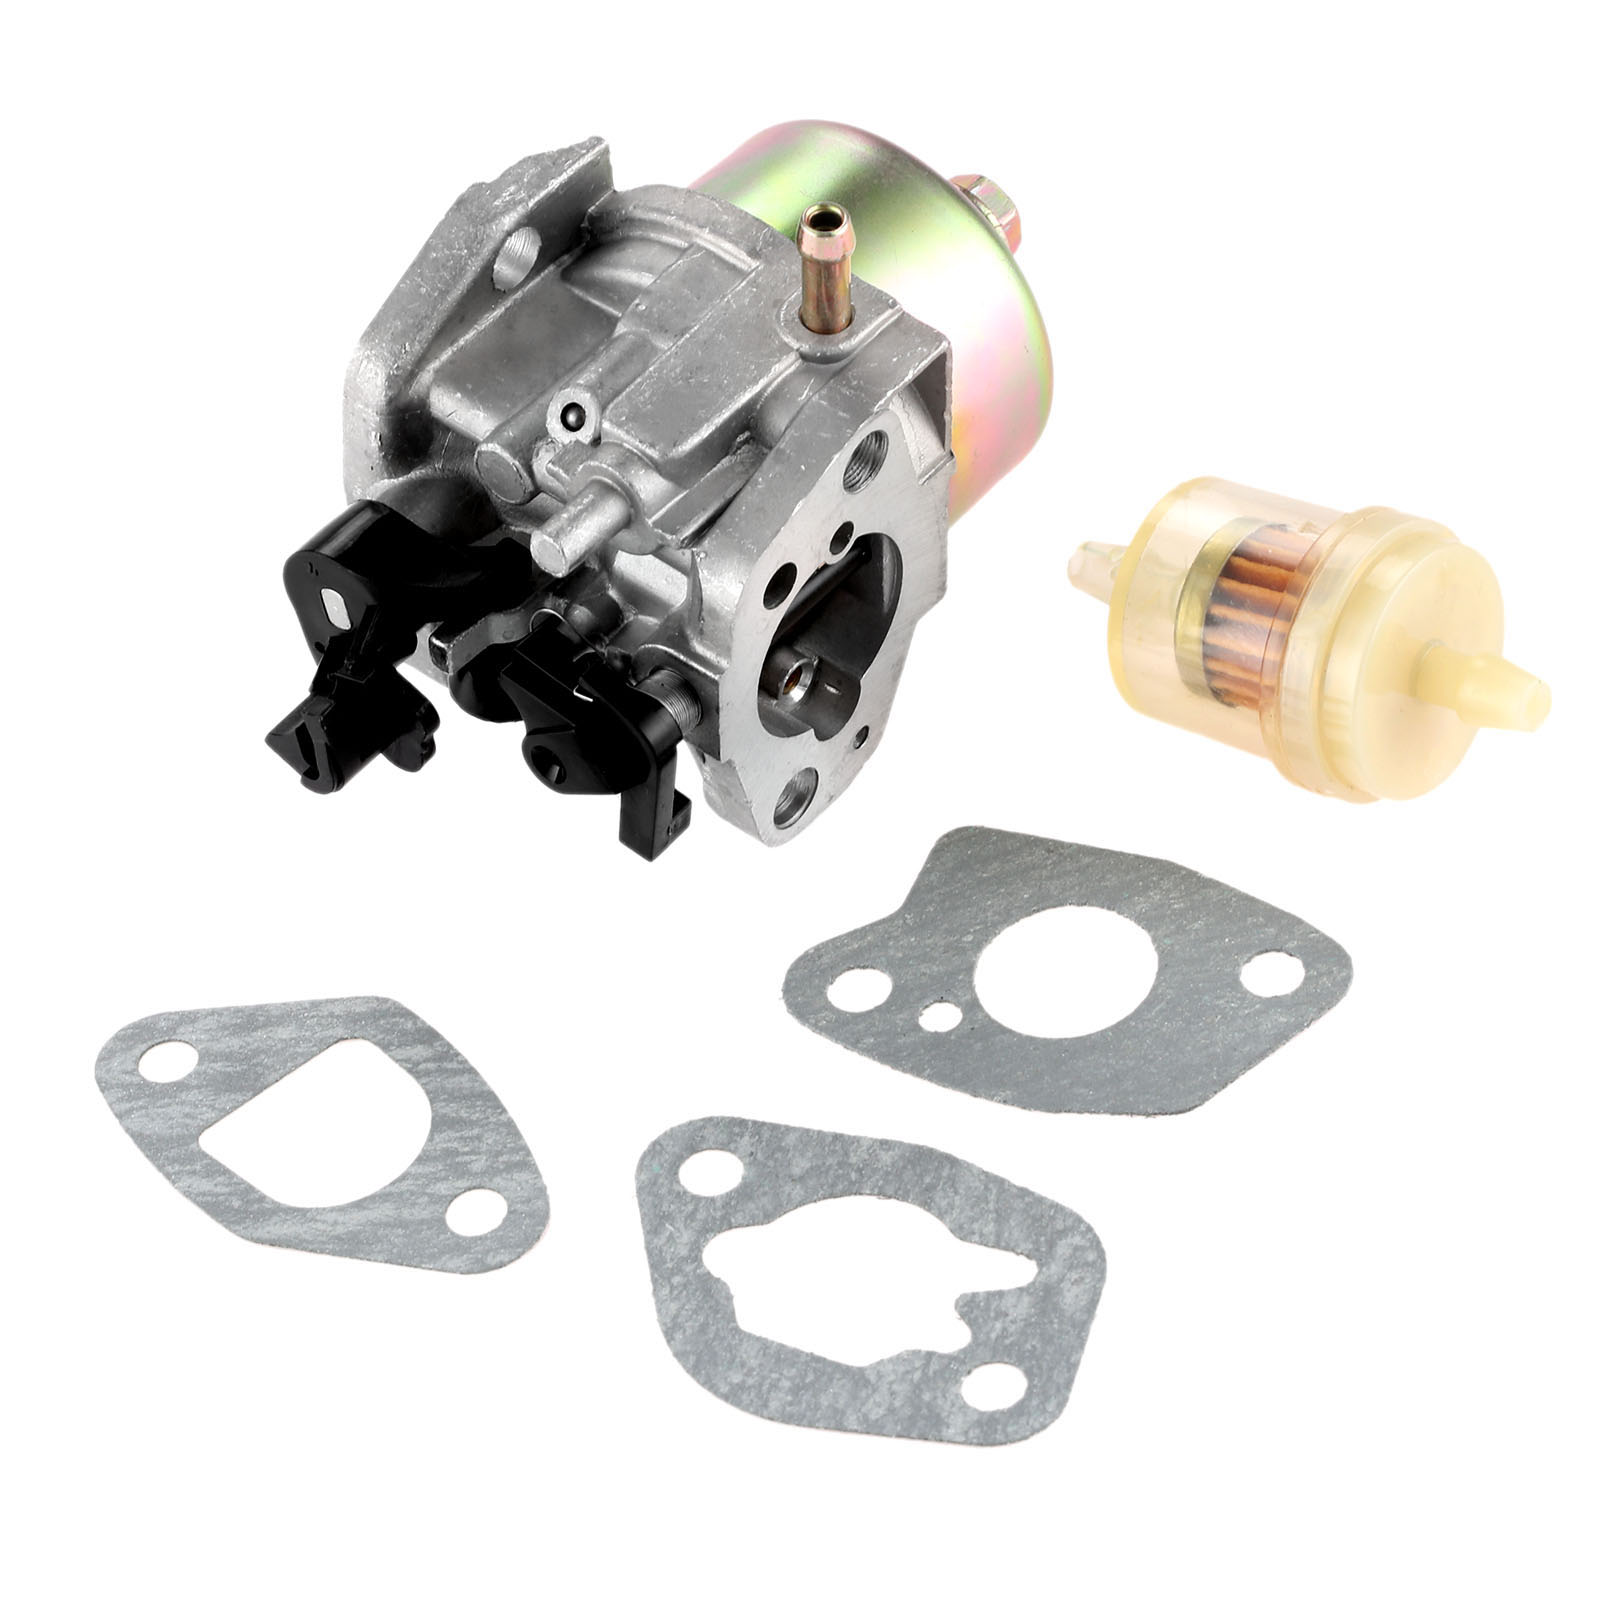 dreld carburetor with carburetor gasket fuel filter for mtd cub cadet troy bilt lawn mower engines [ 1600 x 1600 Pixel ]